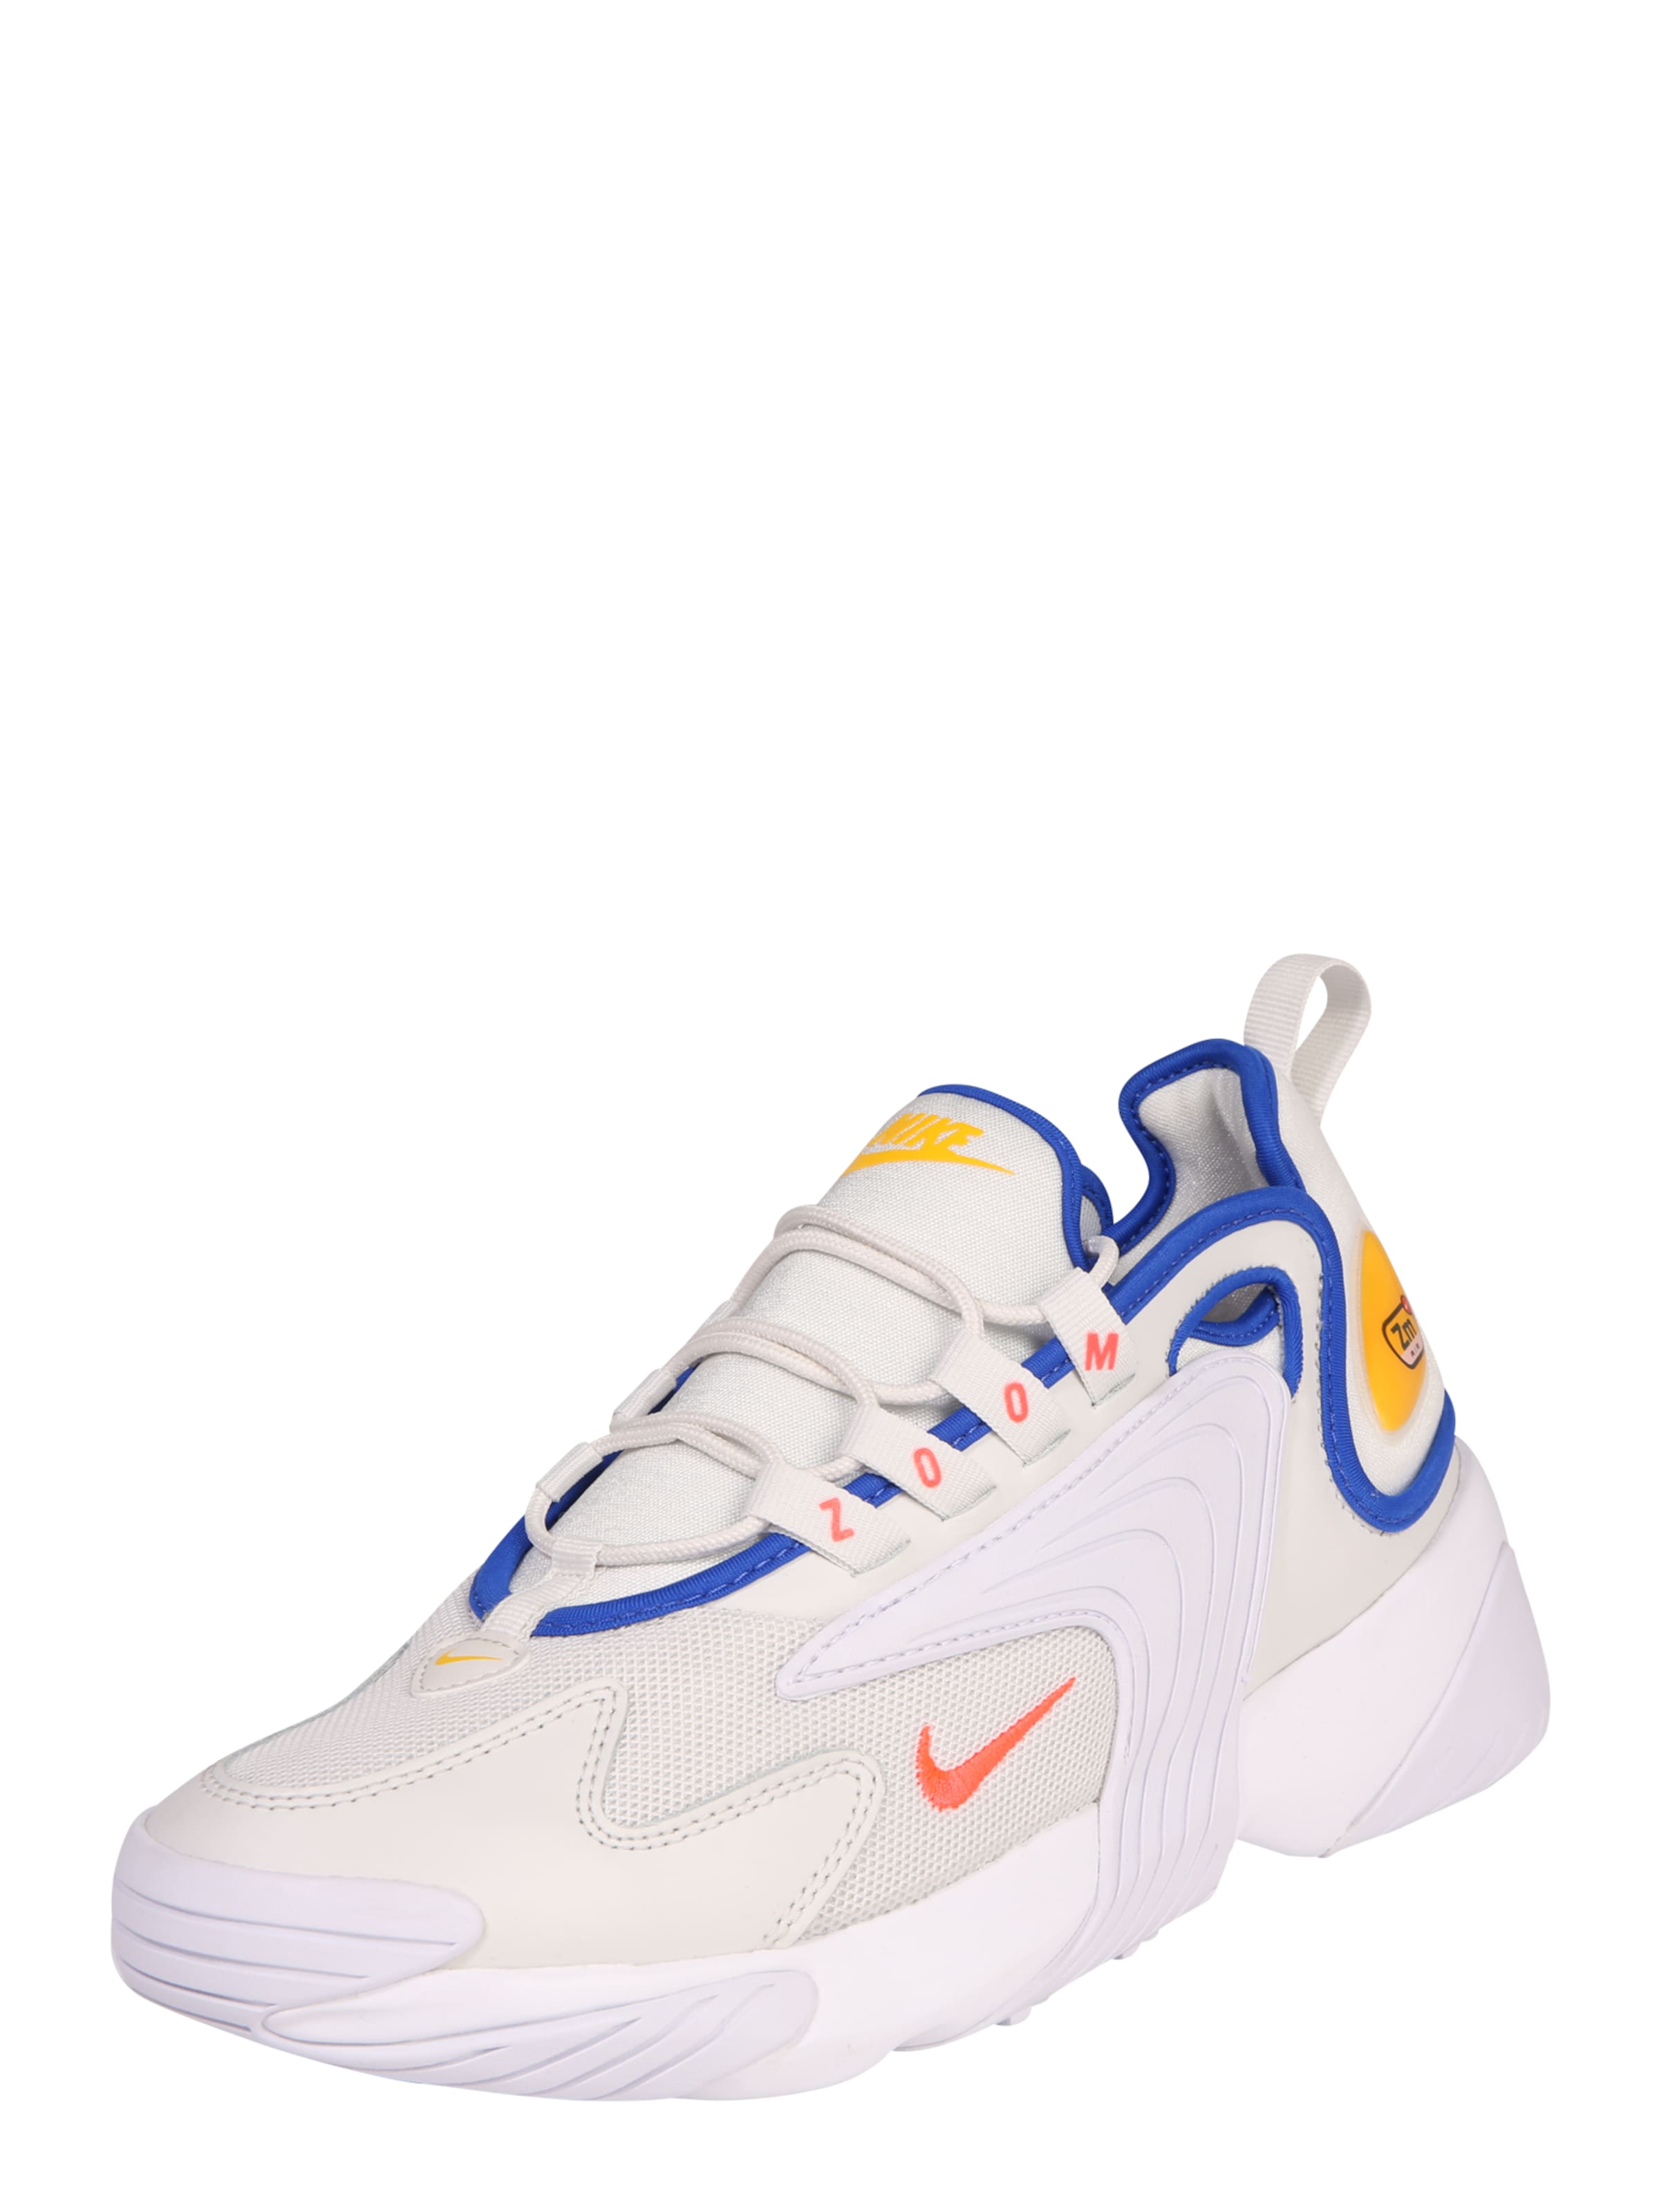 In 2k' Schwarz 'nike Sportswear Sneaker Zoom Nike PiuZkX